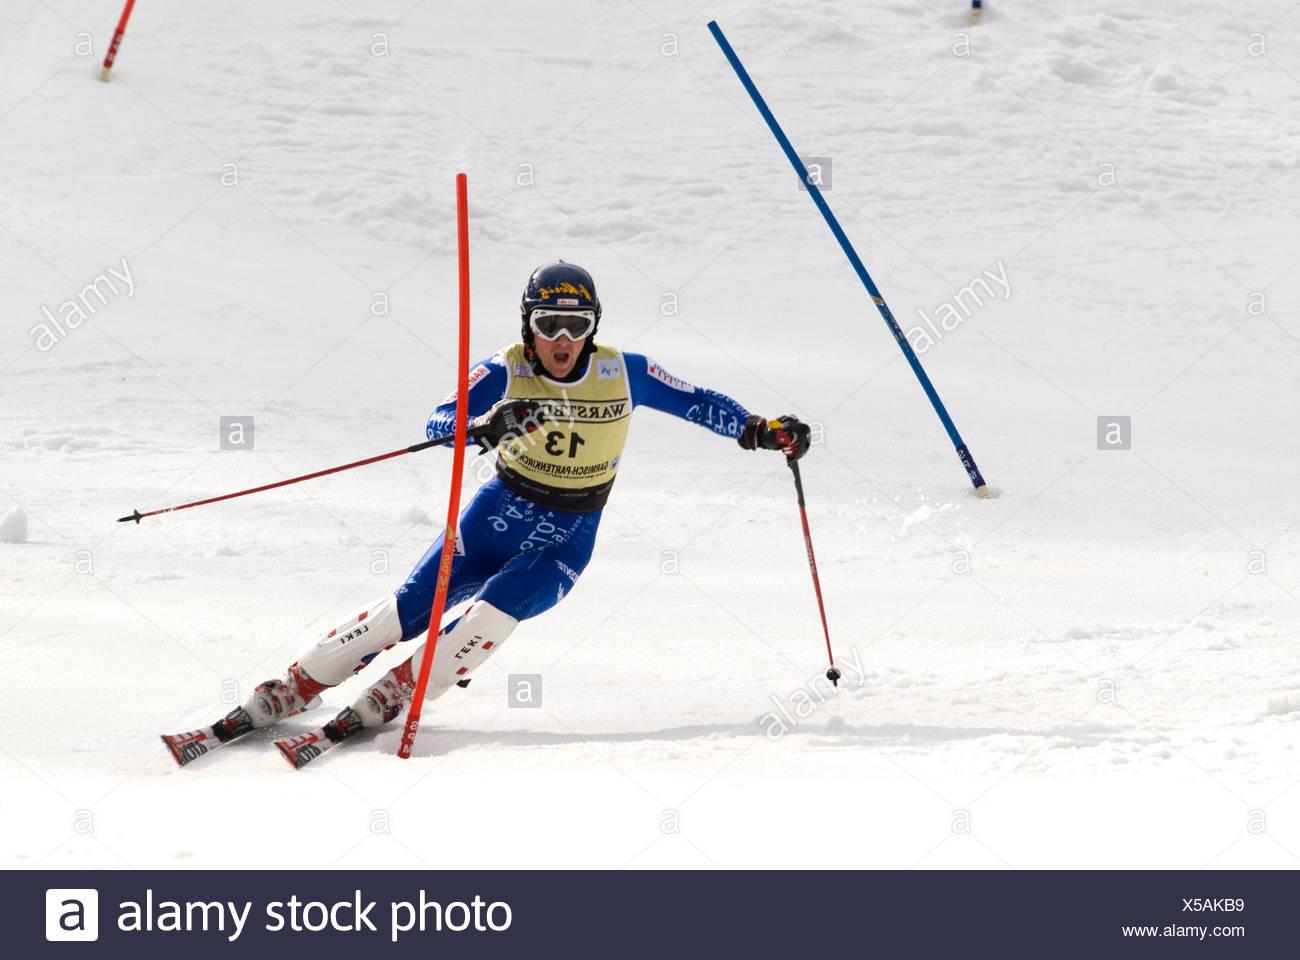 Marc Berthod, Switzerland, FIS Ski Worldcup, Slalom men, Kandahar race, Garmisch-Partenkirchen, Bavaria, Germany - Stock Image